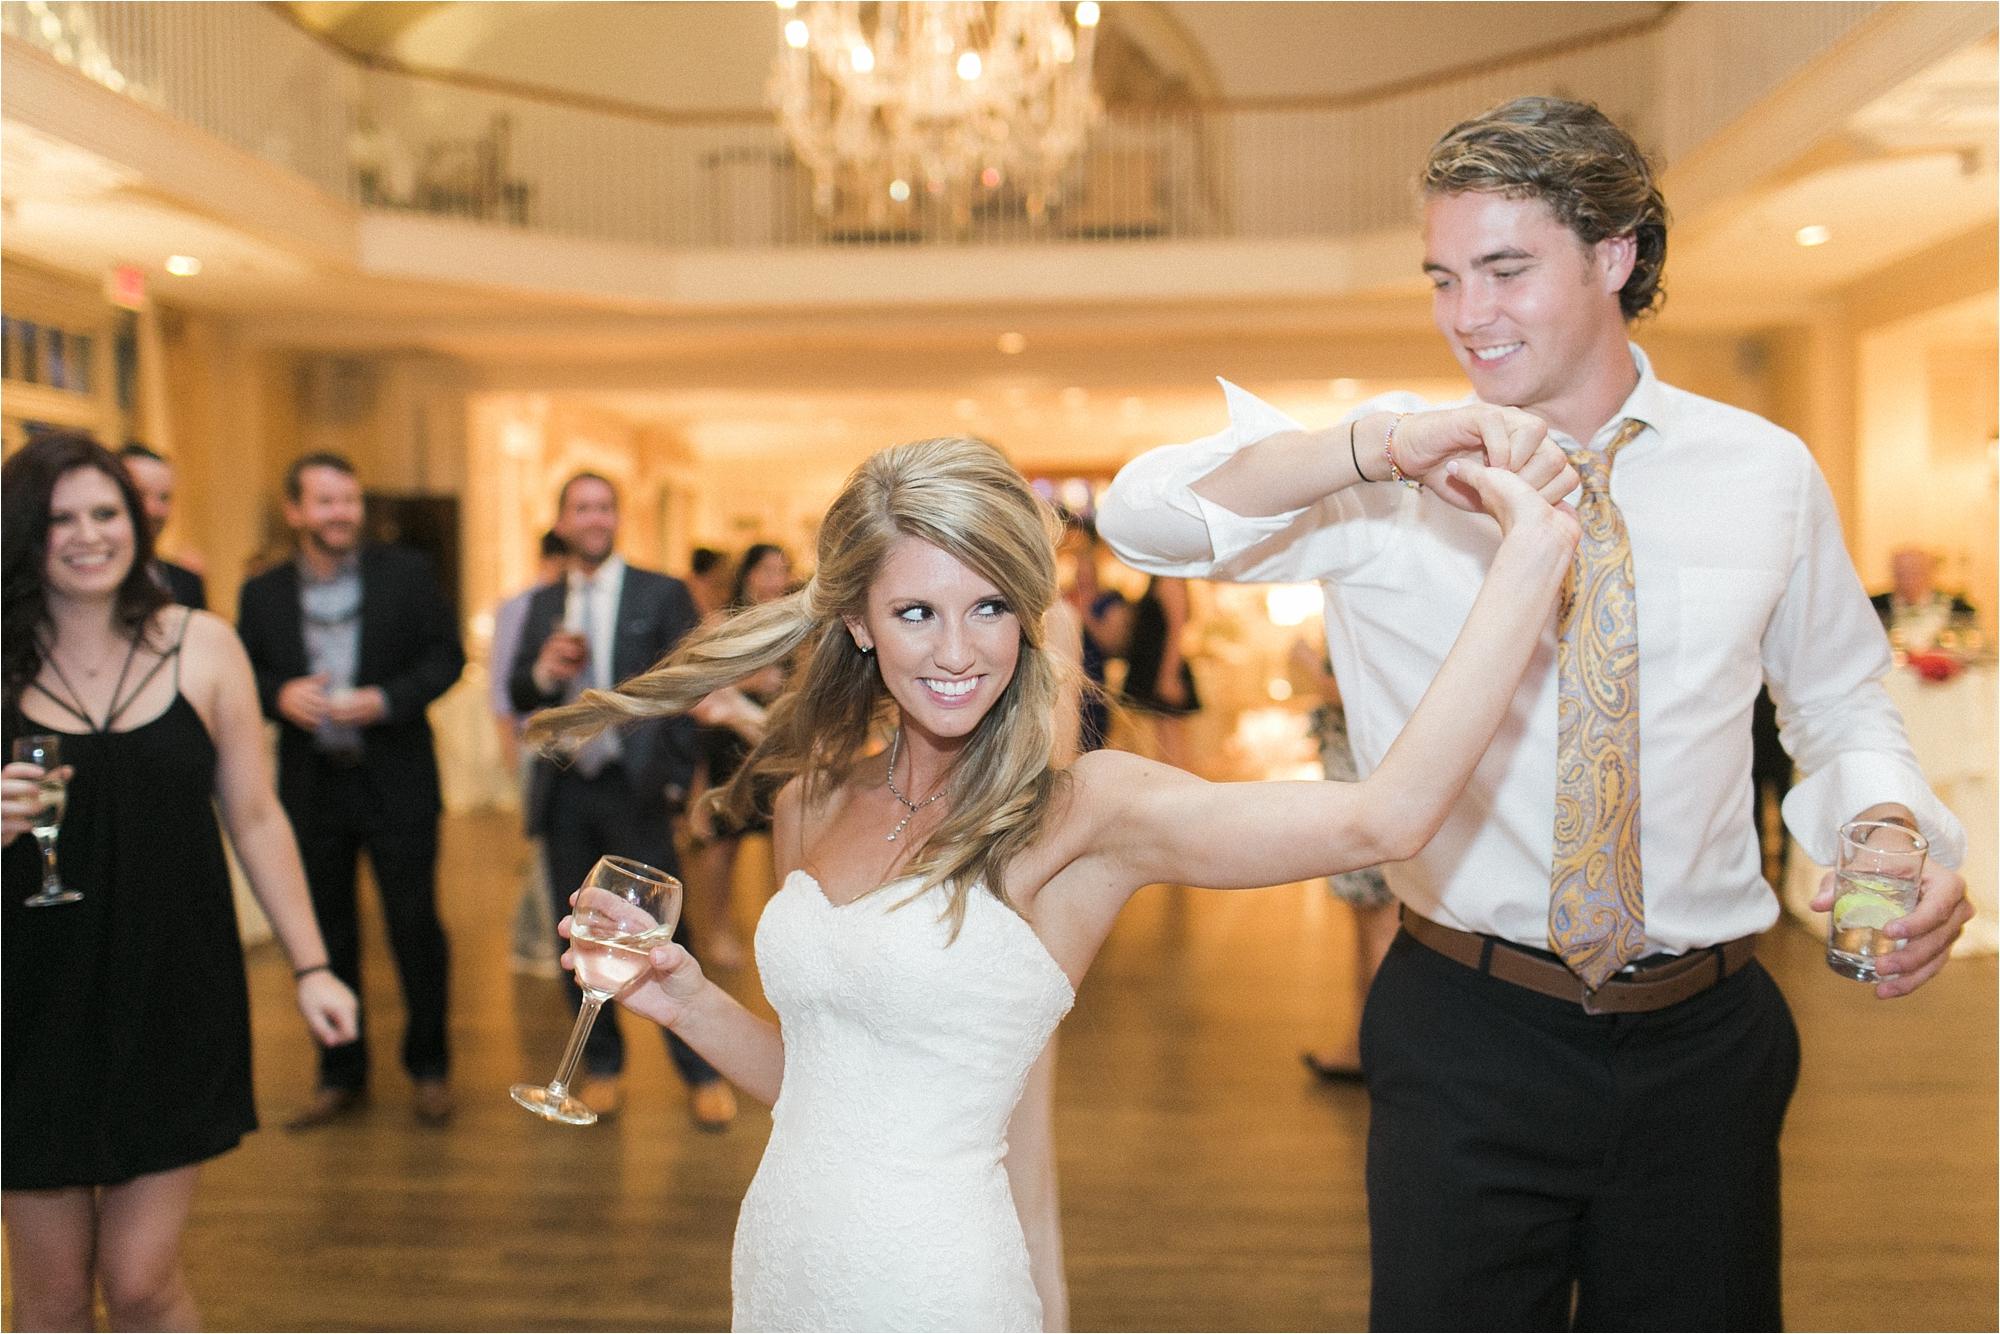 stephanie-yonce-photography-richmond-virginia-country-club-wedding_0051.jpg